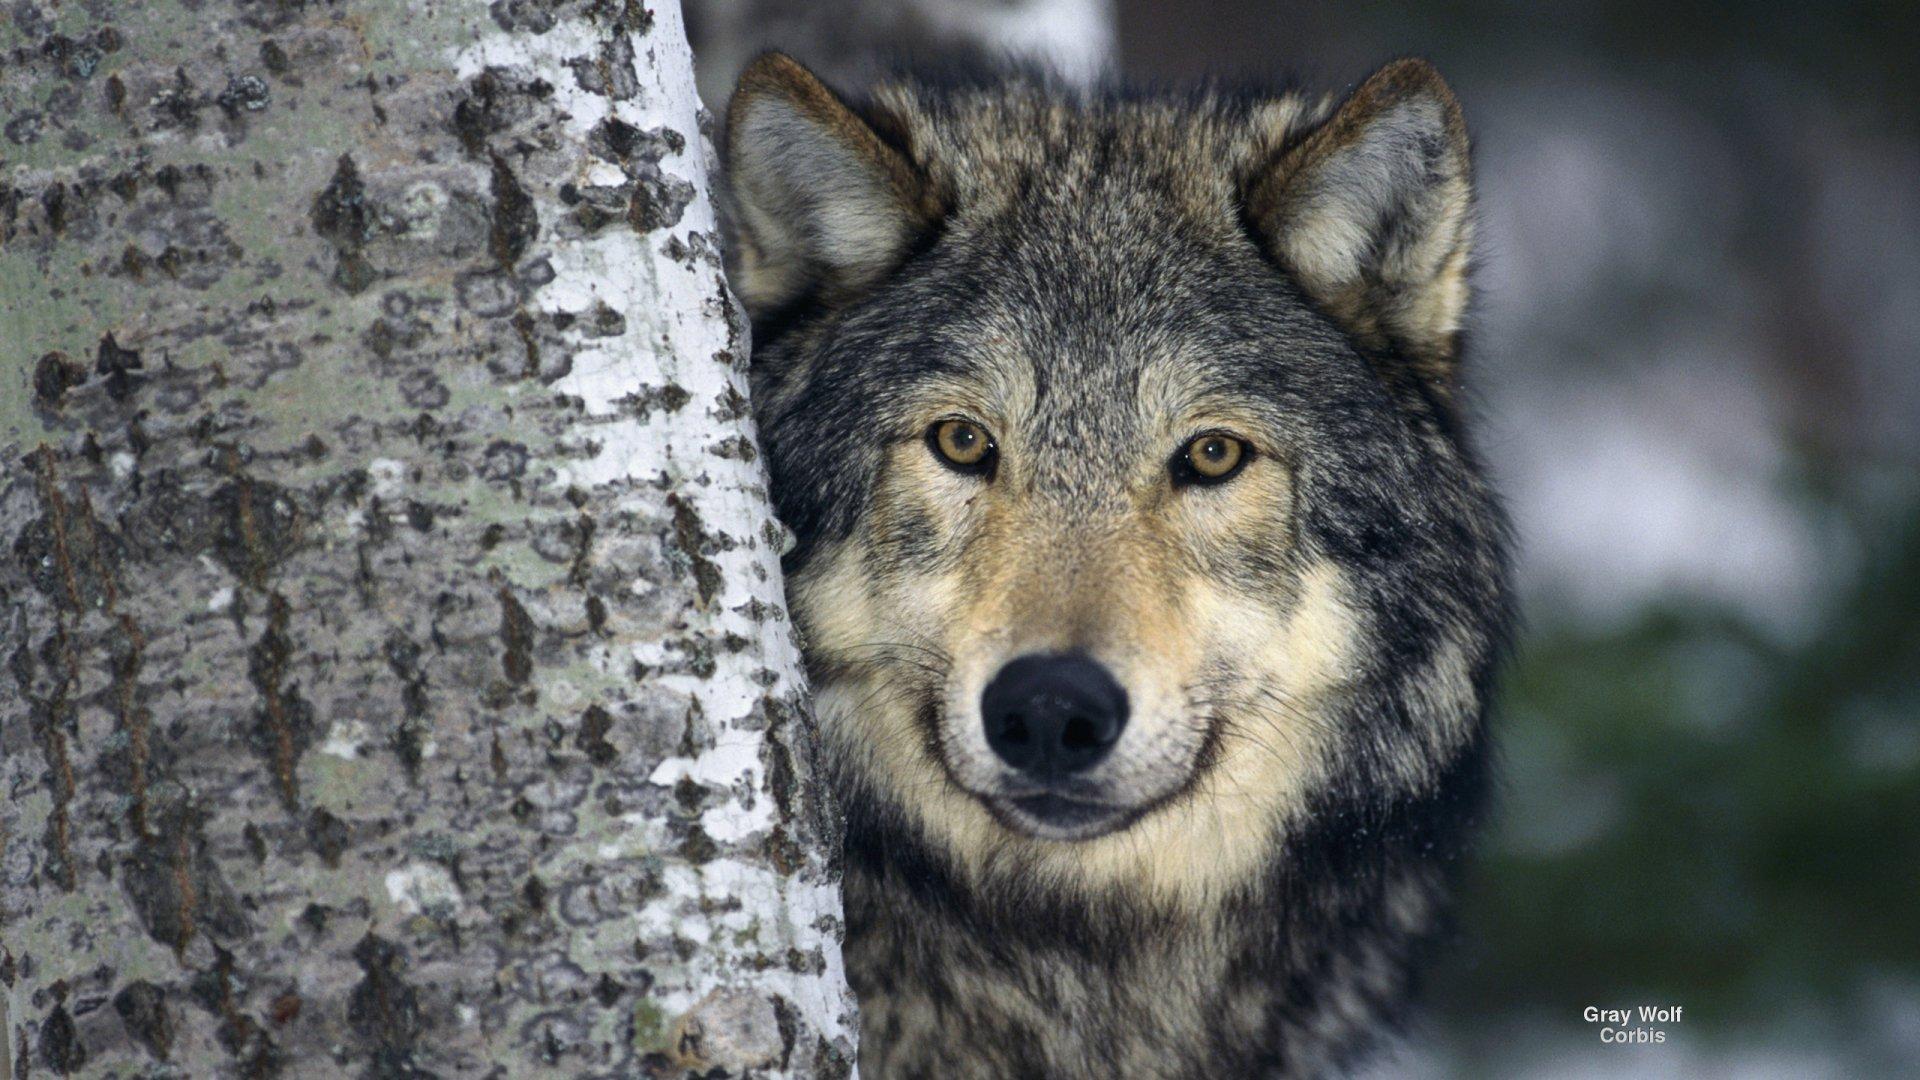 Wild Animal Wolf Wallpapers Hd 51074 Wallpaper: Gray Wolf HD Wallpaper